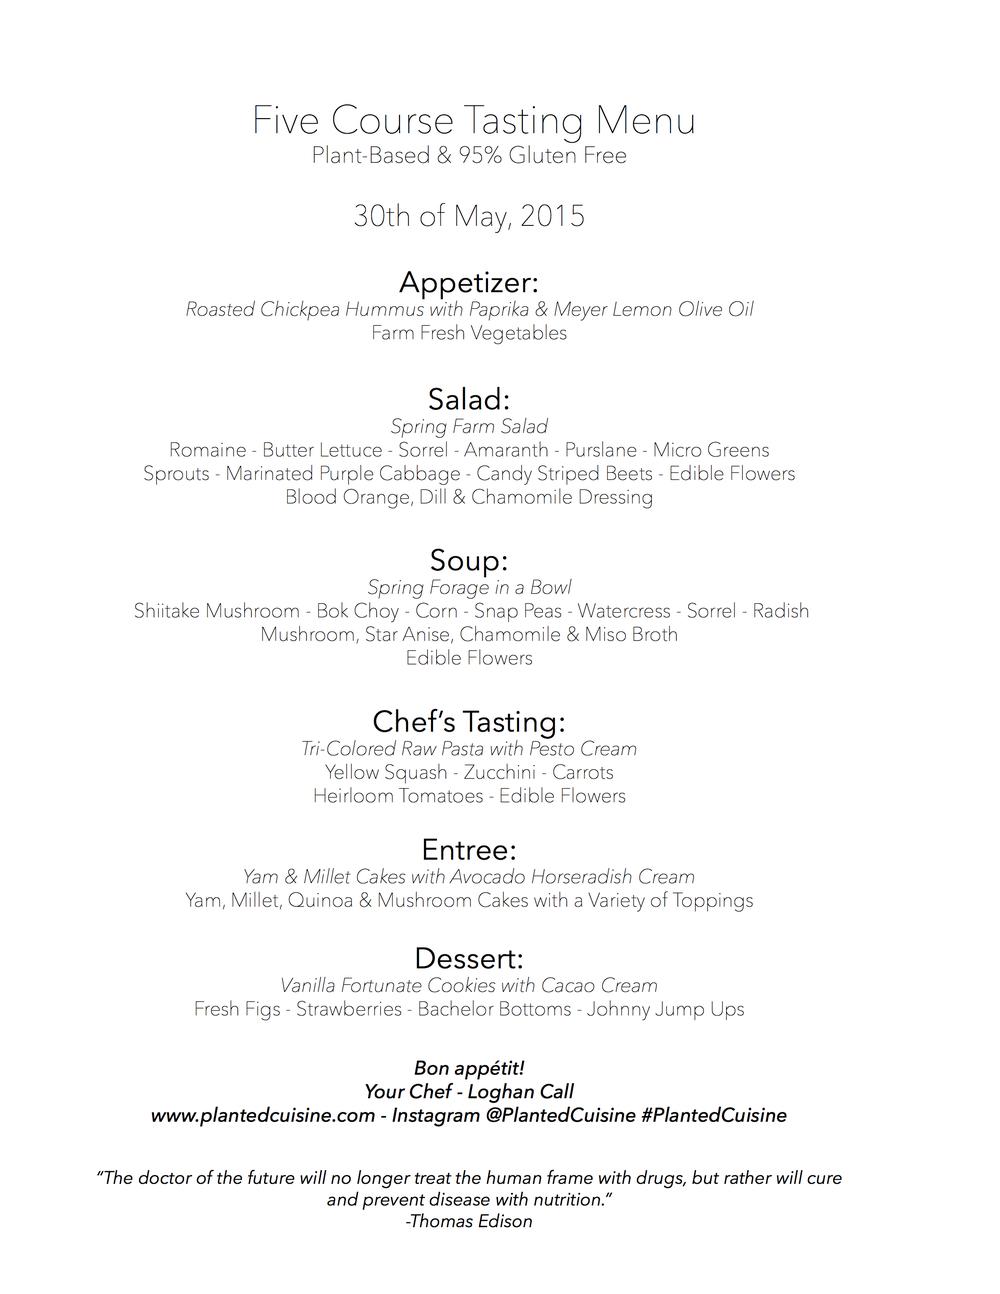 Chef's Tasting Menu - 5.30.15.jpg